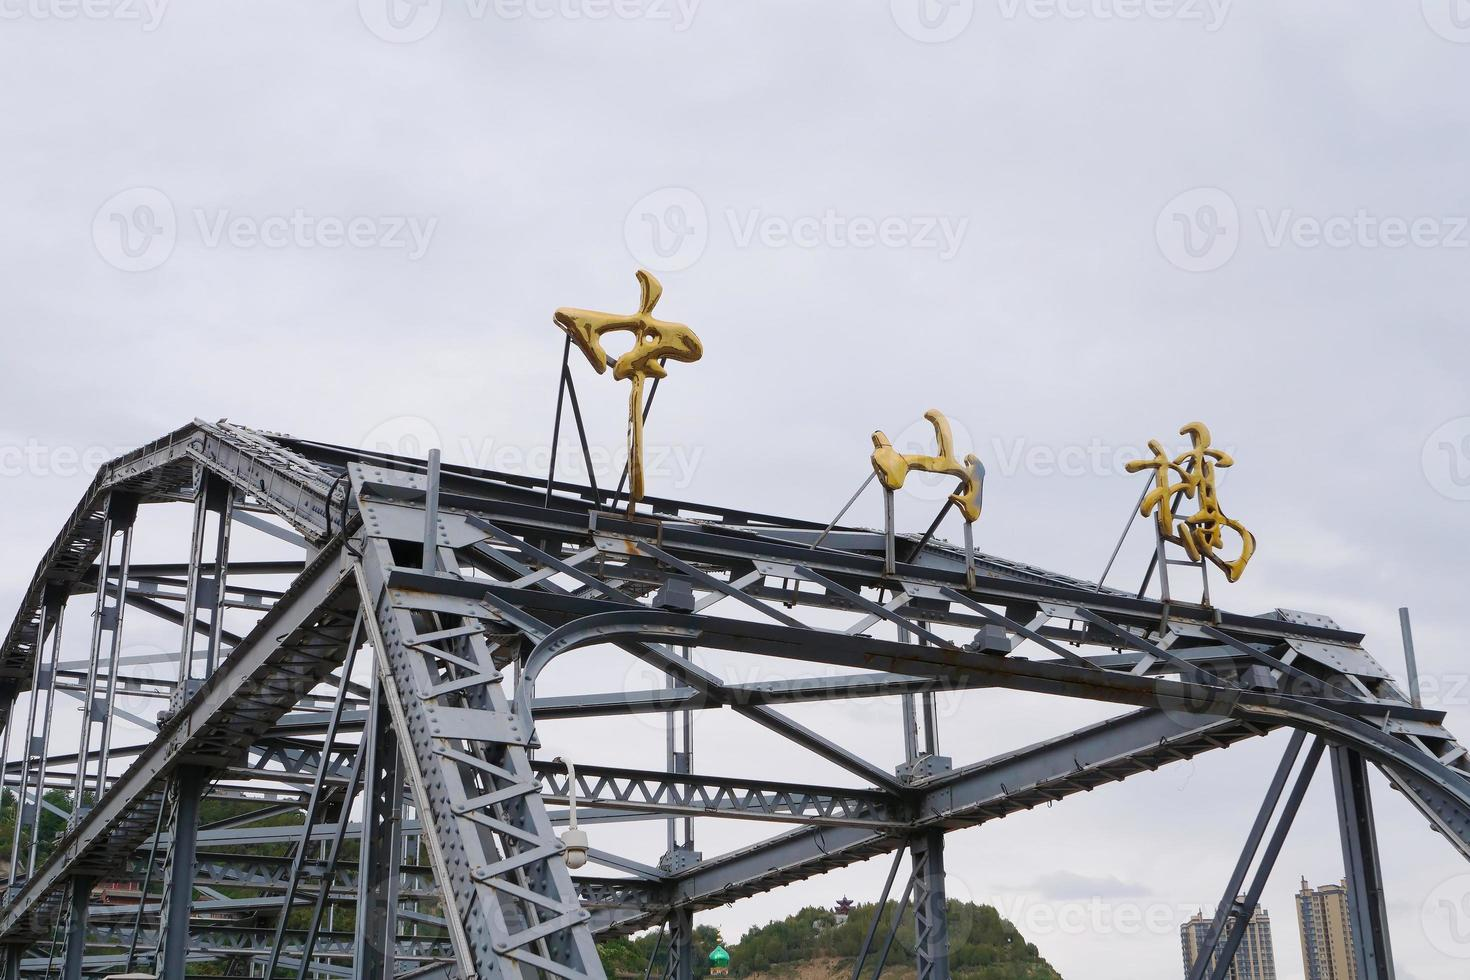 ponte zhongshan perto do rio amarelo em lanzhou gansu china foto